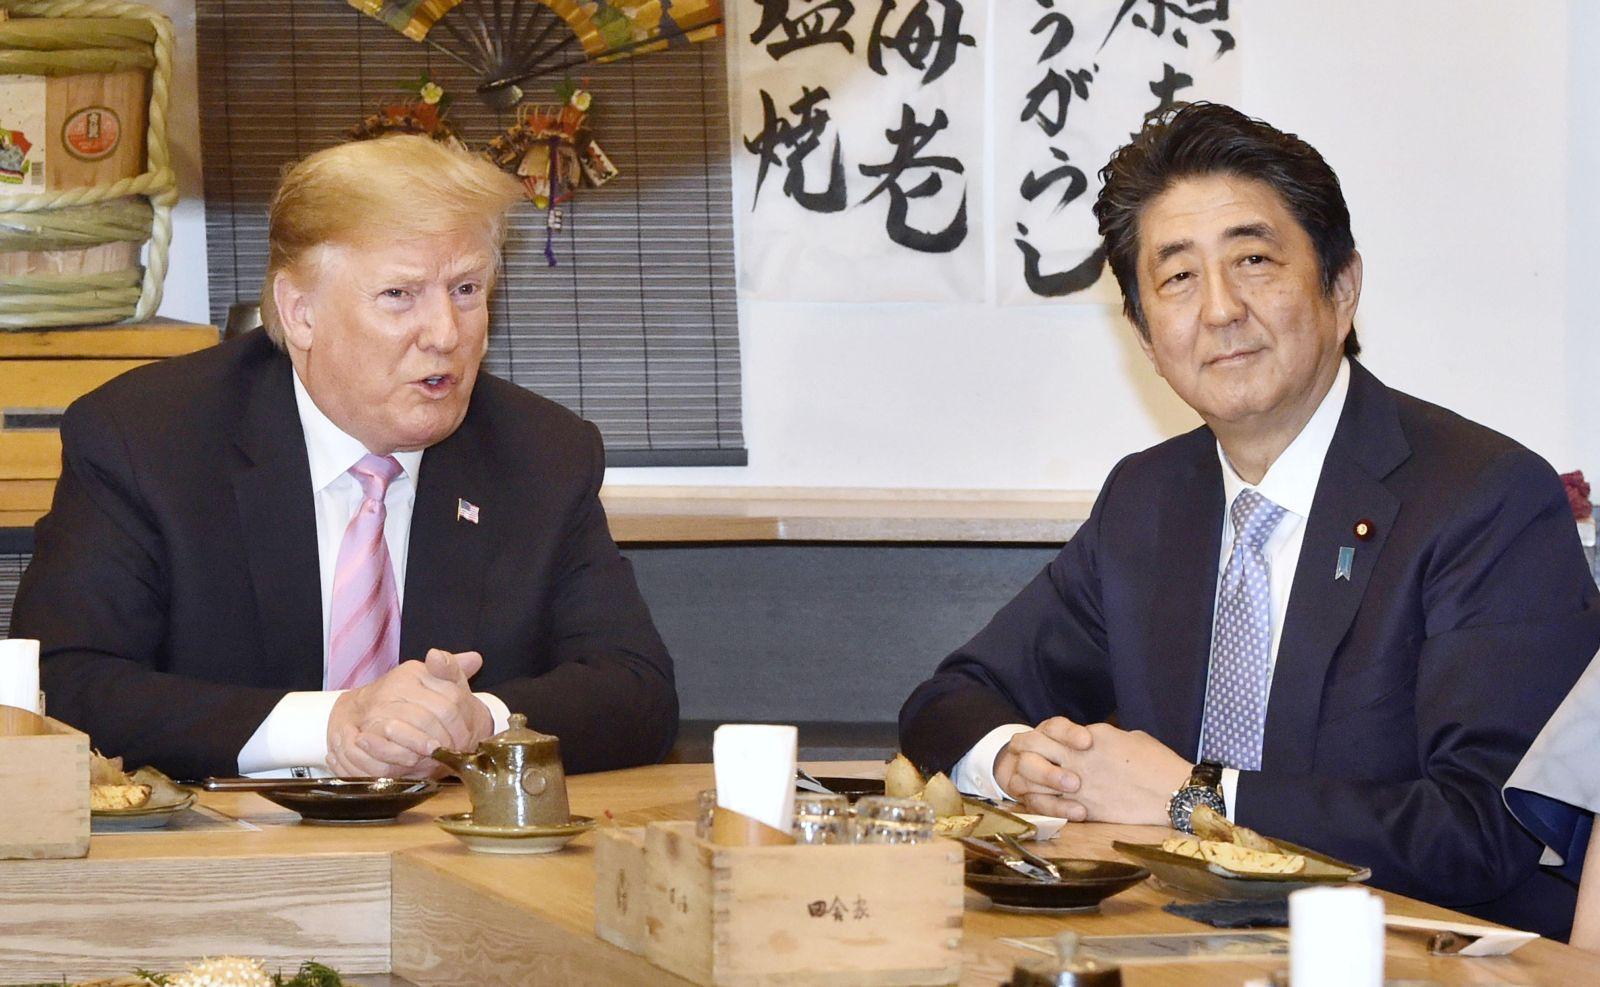 U.S. President Trump Visit to Japan Reiwa Era 045